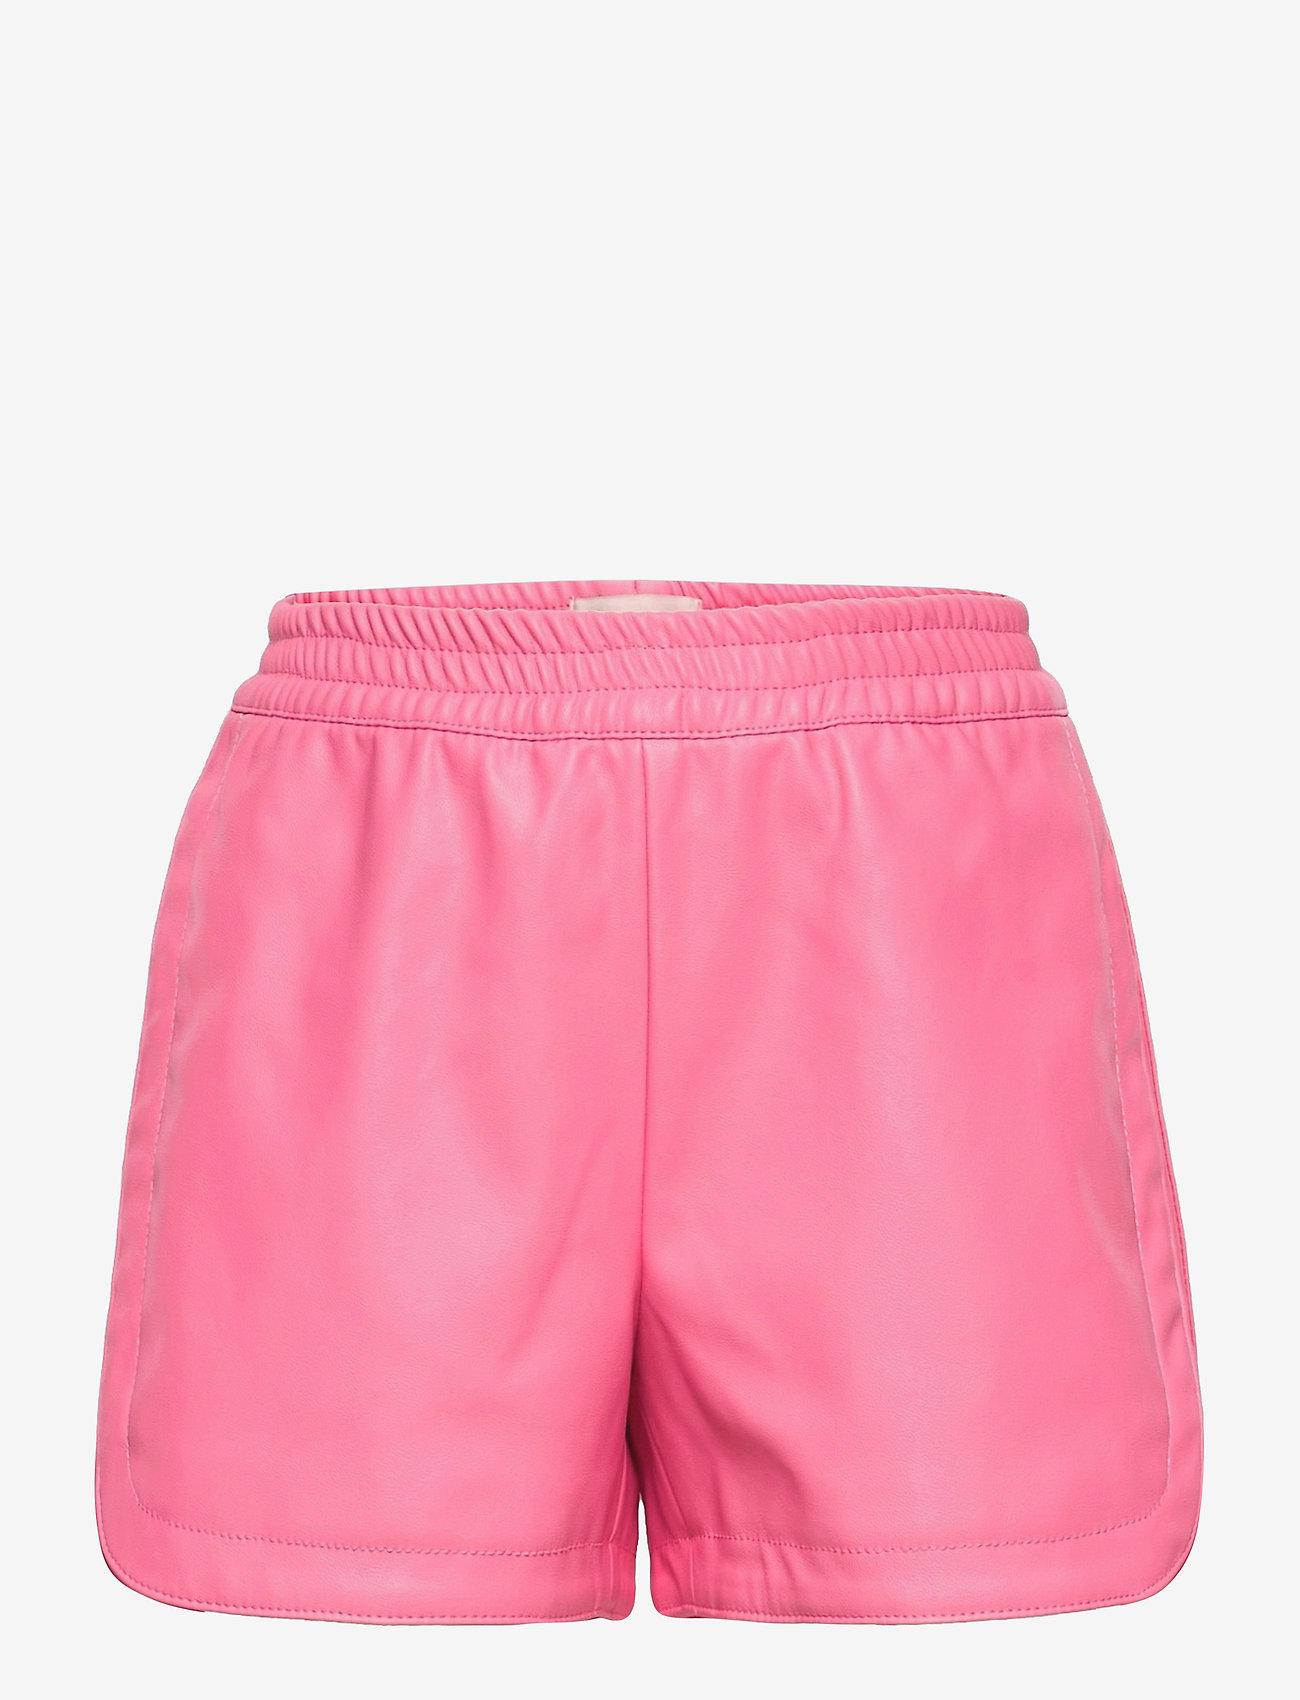 Kids Only - KONBELLA SPORTY PU SHORTS PNT - shorts - aurora pink - 0